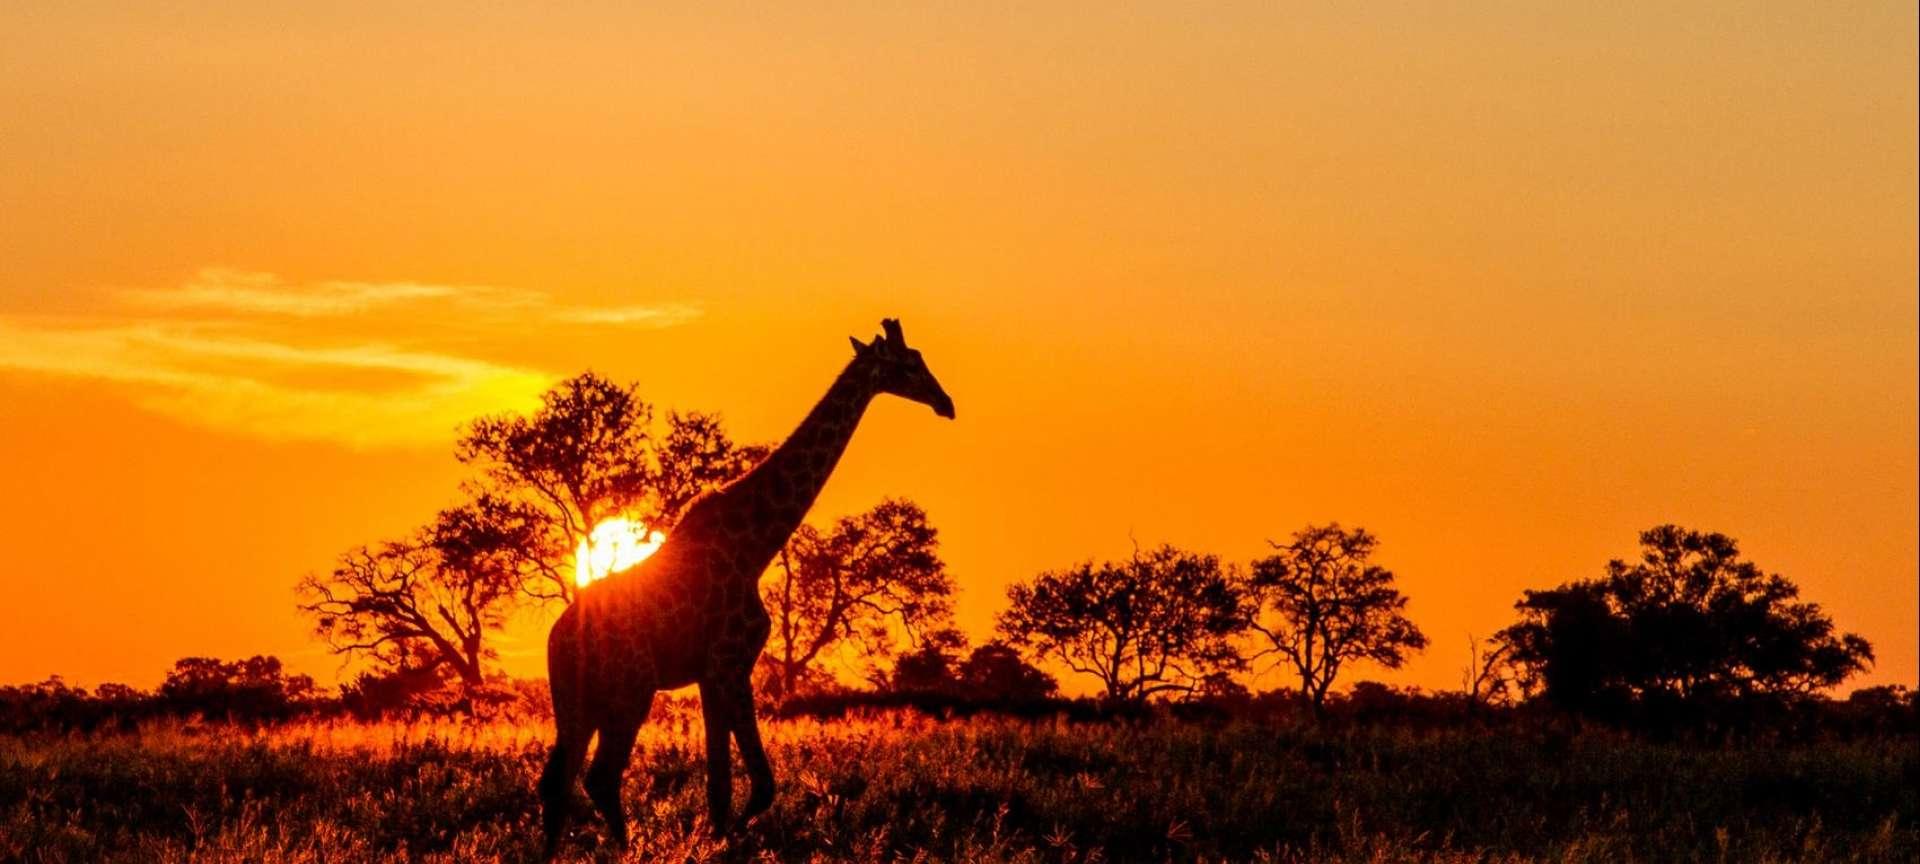 Tanzania Southern Circuit - Africa Wildlife Safaris